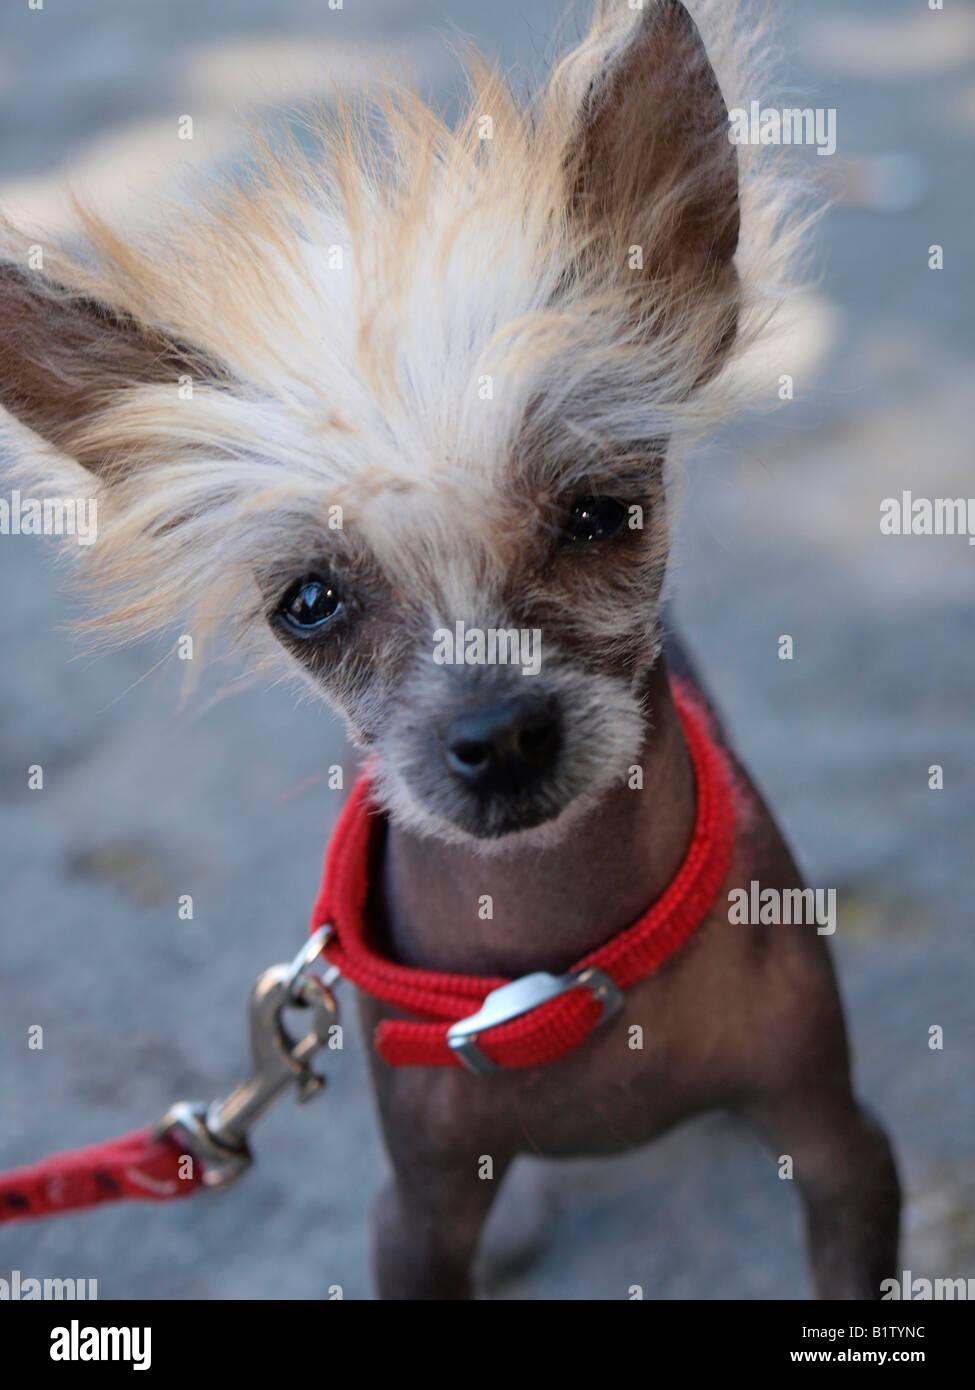 Cute Dog Haircut Stock Photos Cute Dog Haircut Stock Images Alamy